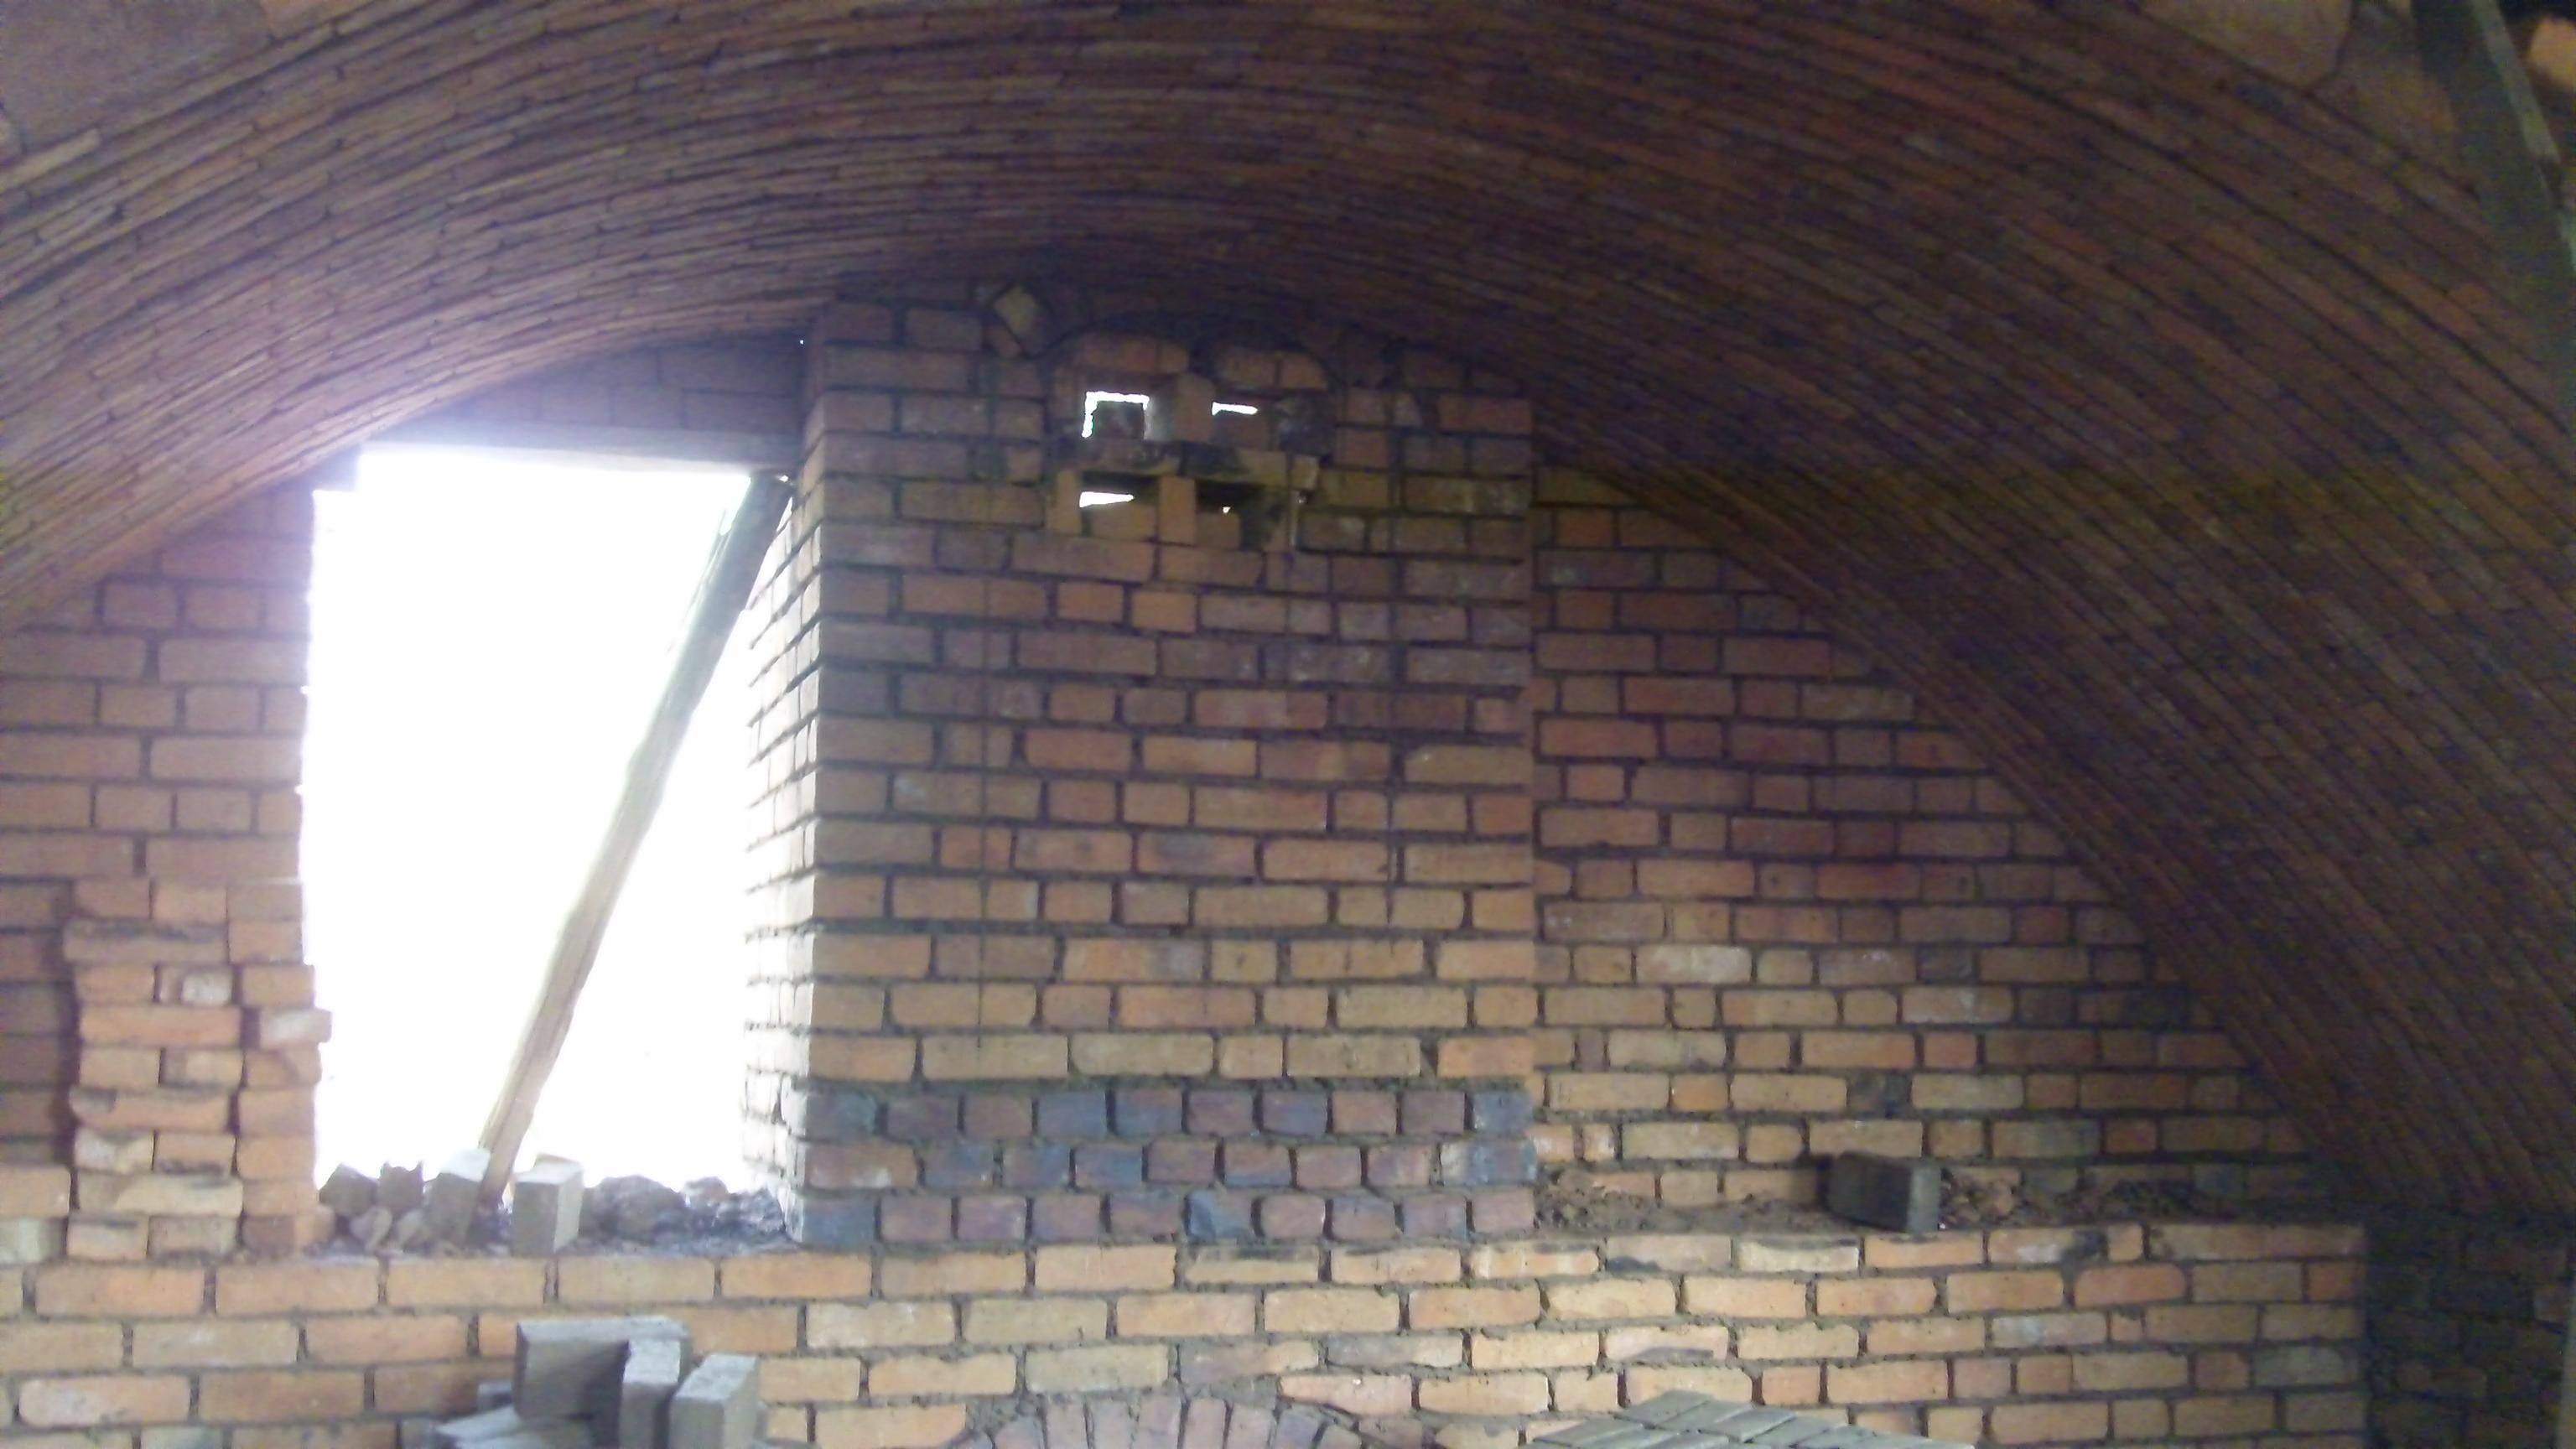 Clamp kiln vault and chimney-303_0546.jpg